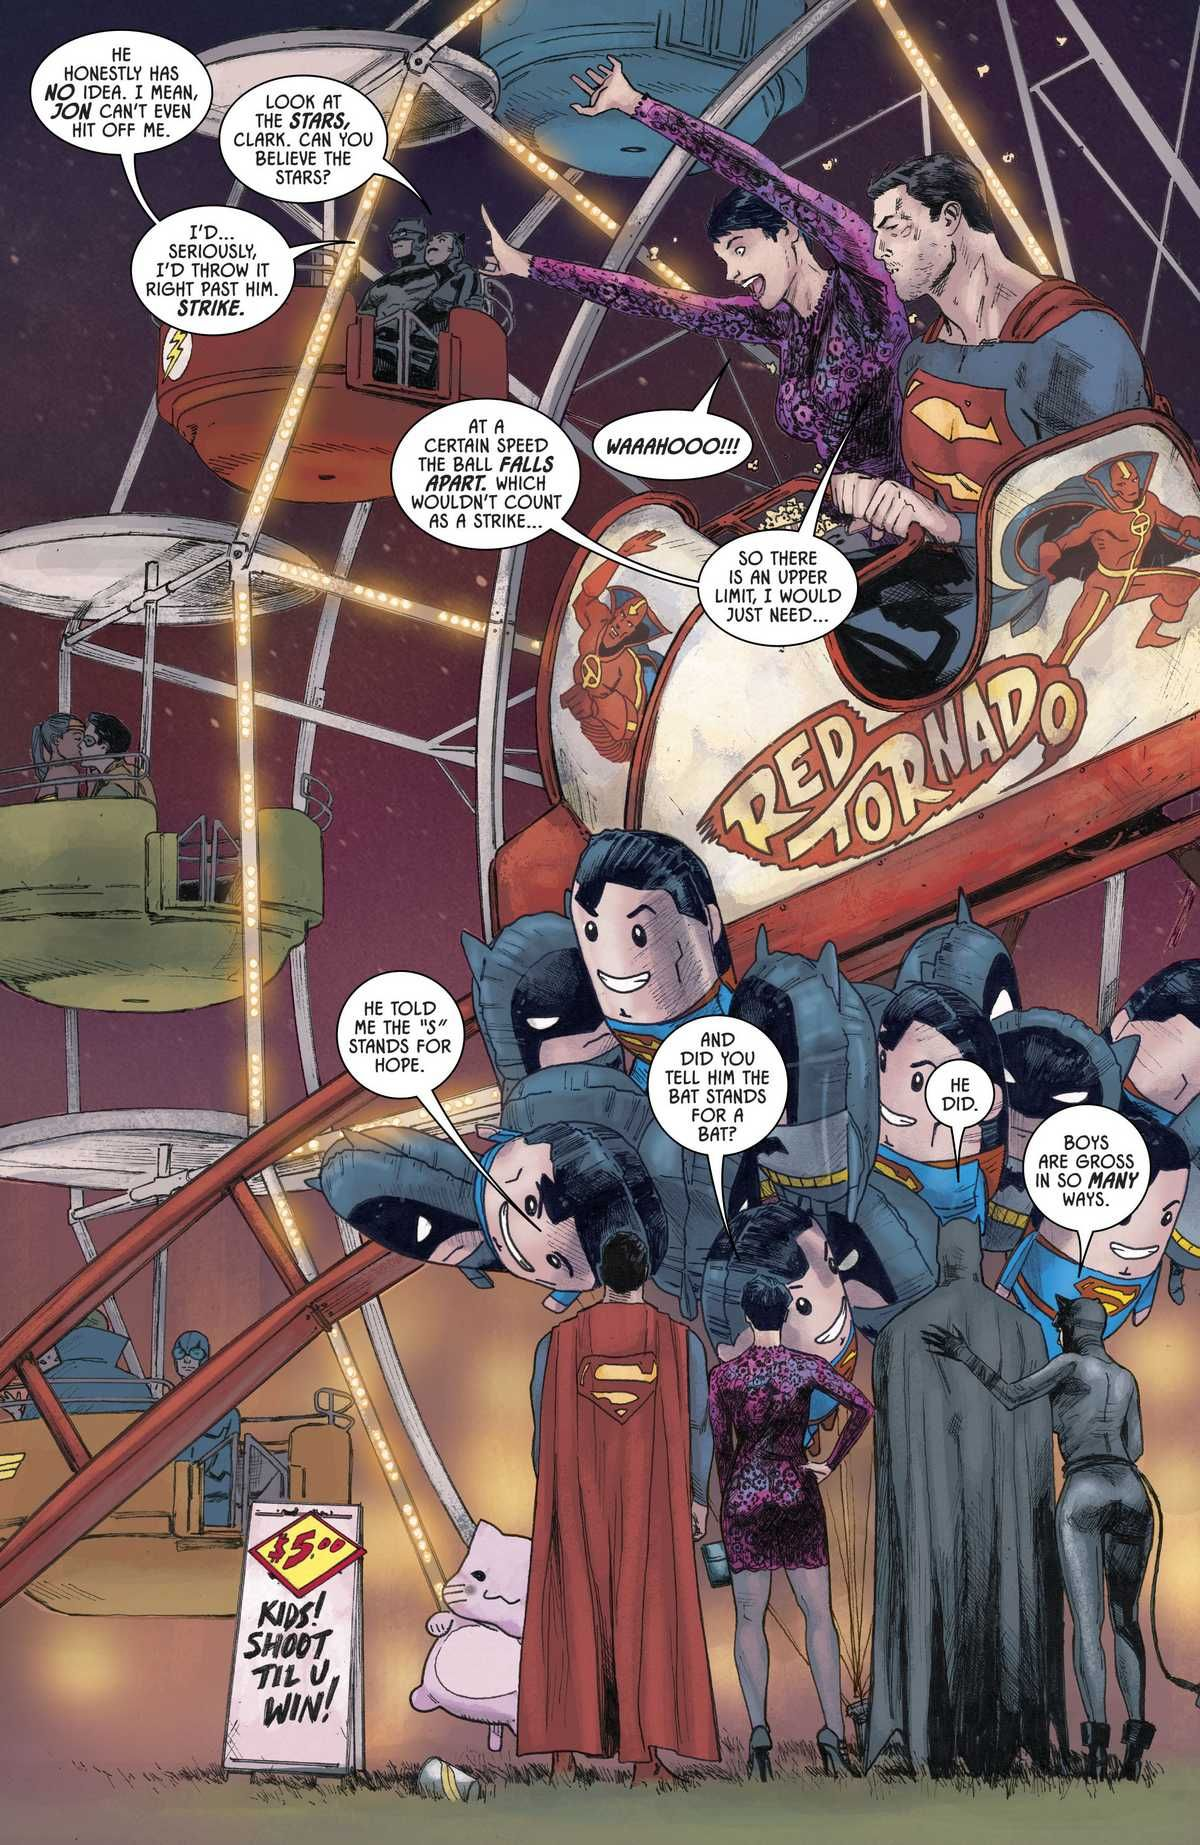 Batman Legends Of The Dark Knight Issue 202 | Read Batman